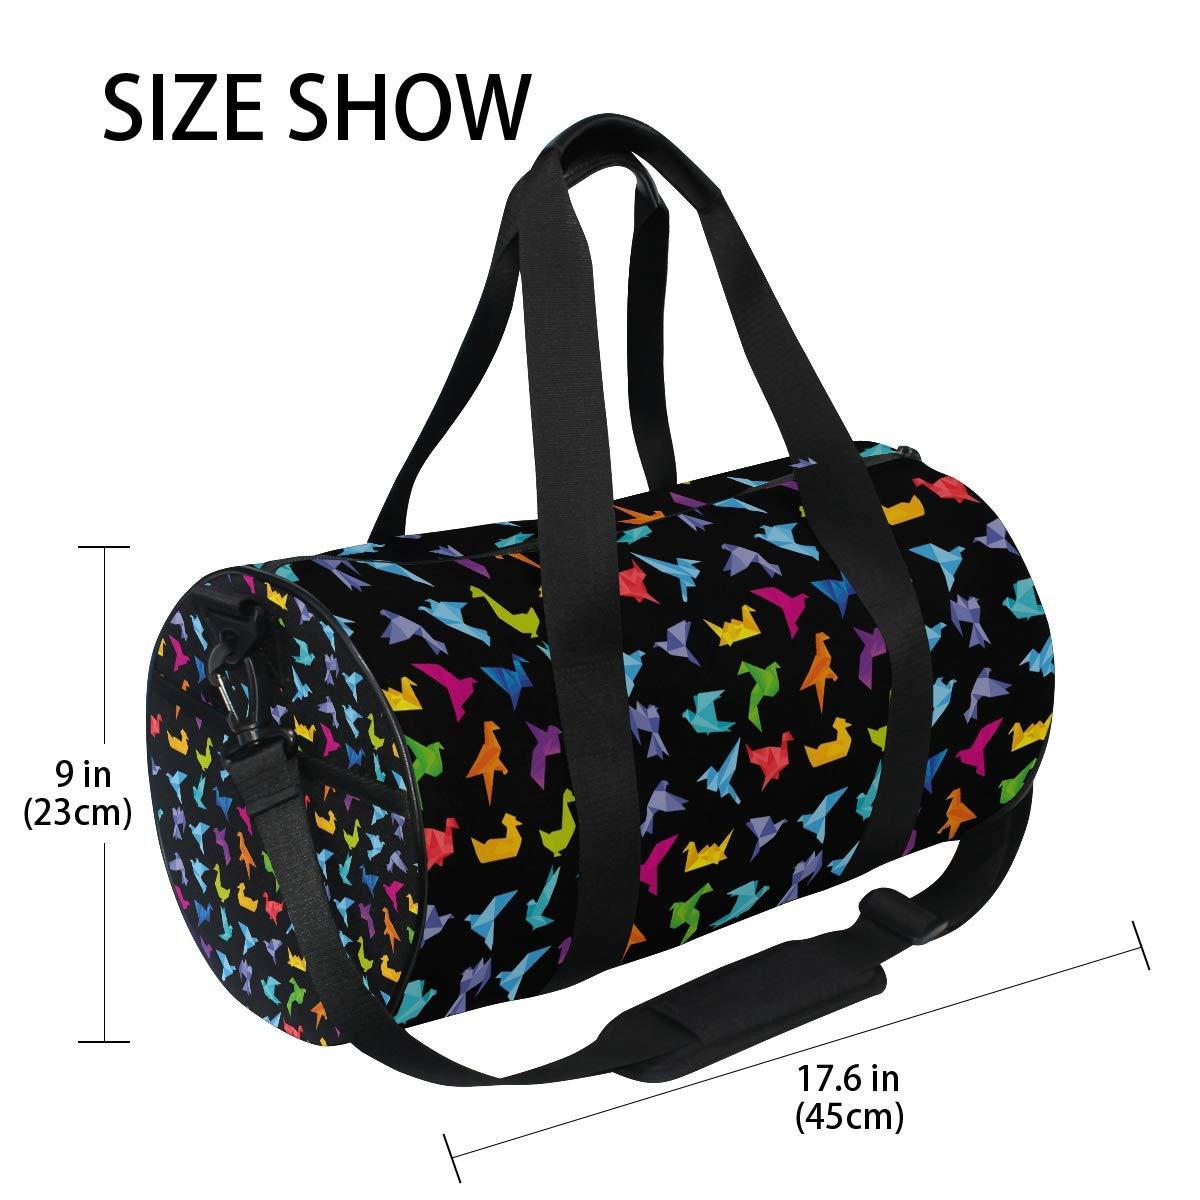 Sports Gym Duffel Barrel Bag Origami Bird Art Japan Craft Travel Luggage Handbag for Men Women